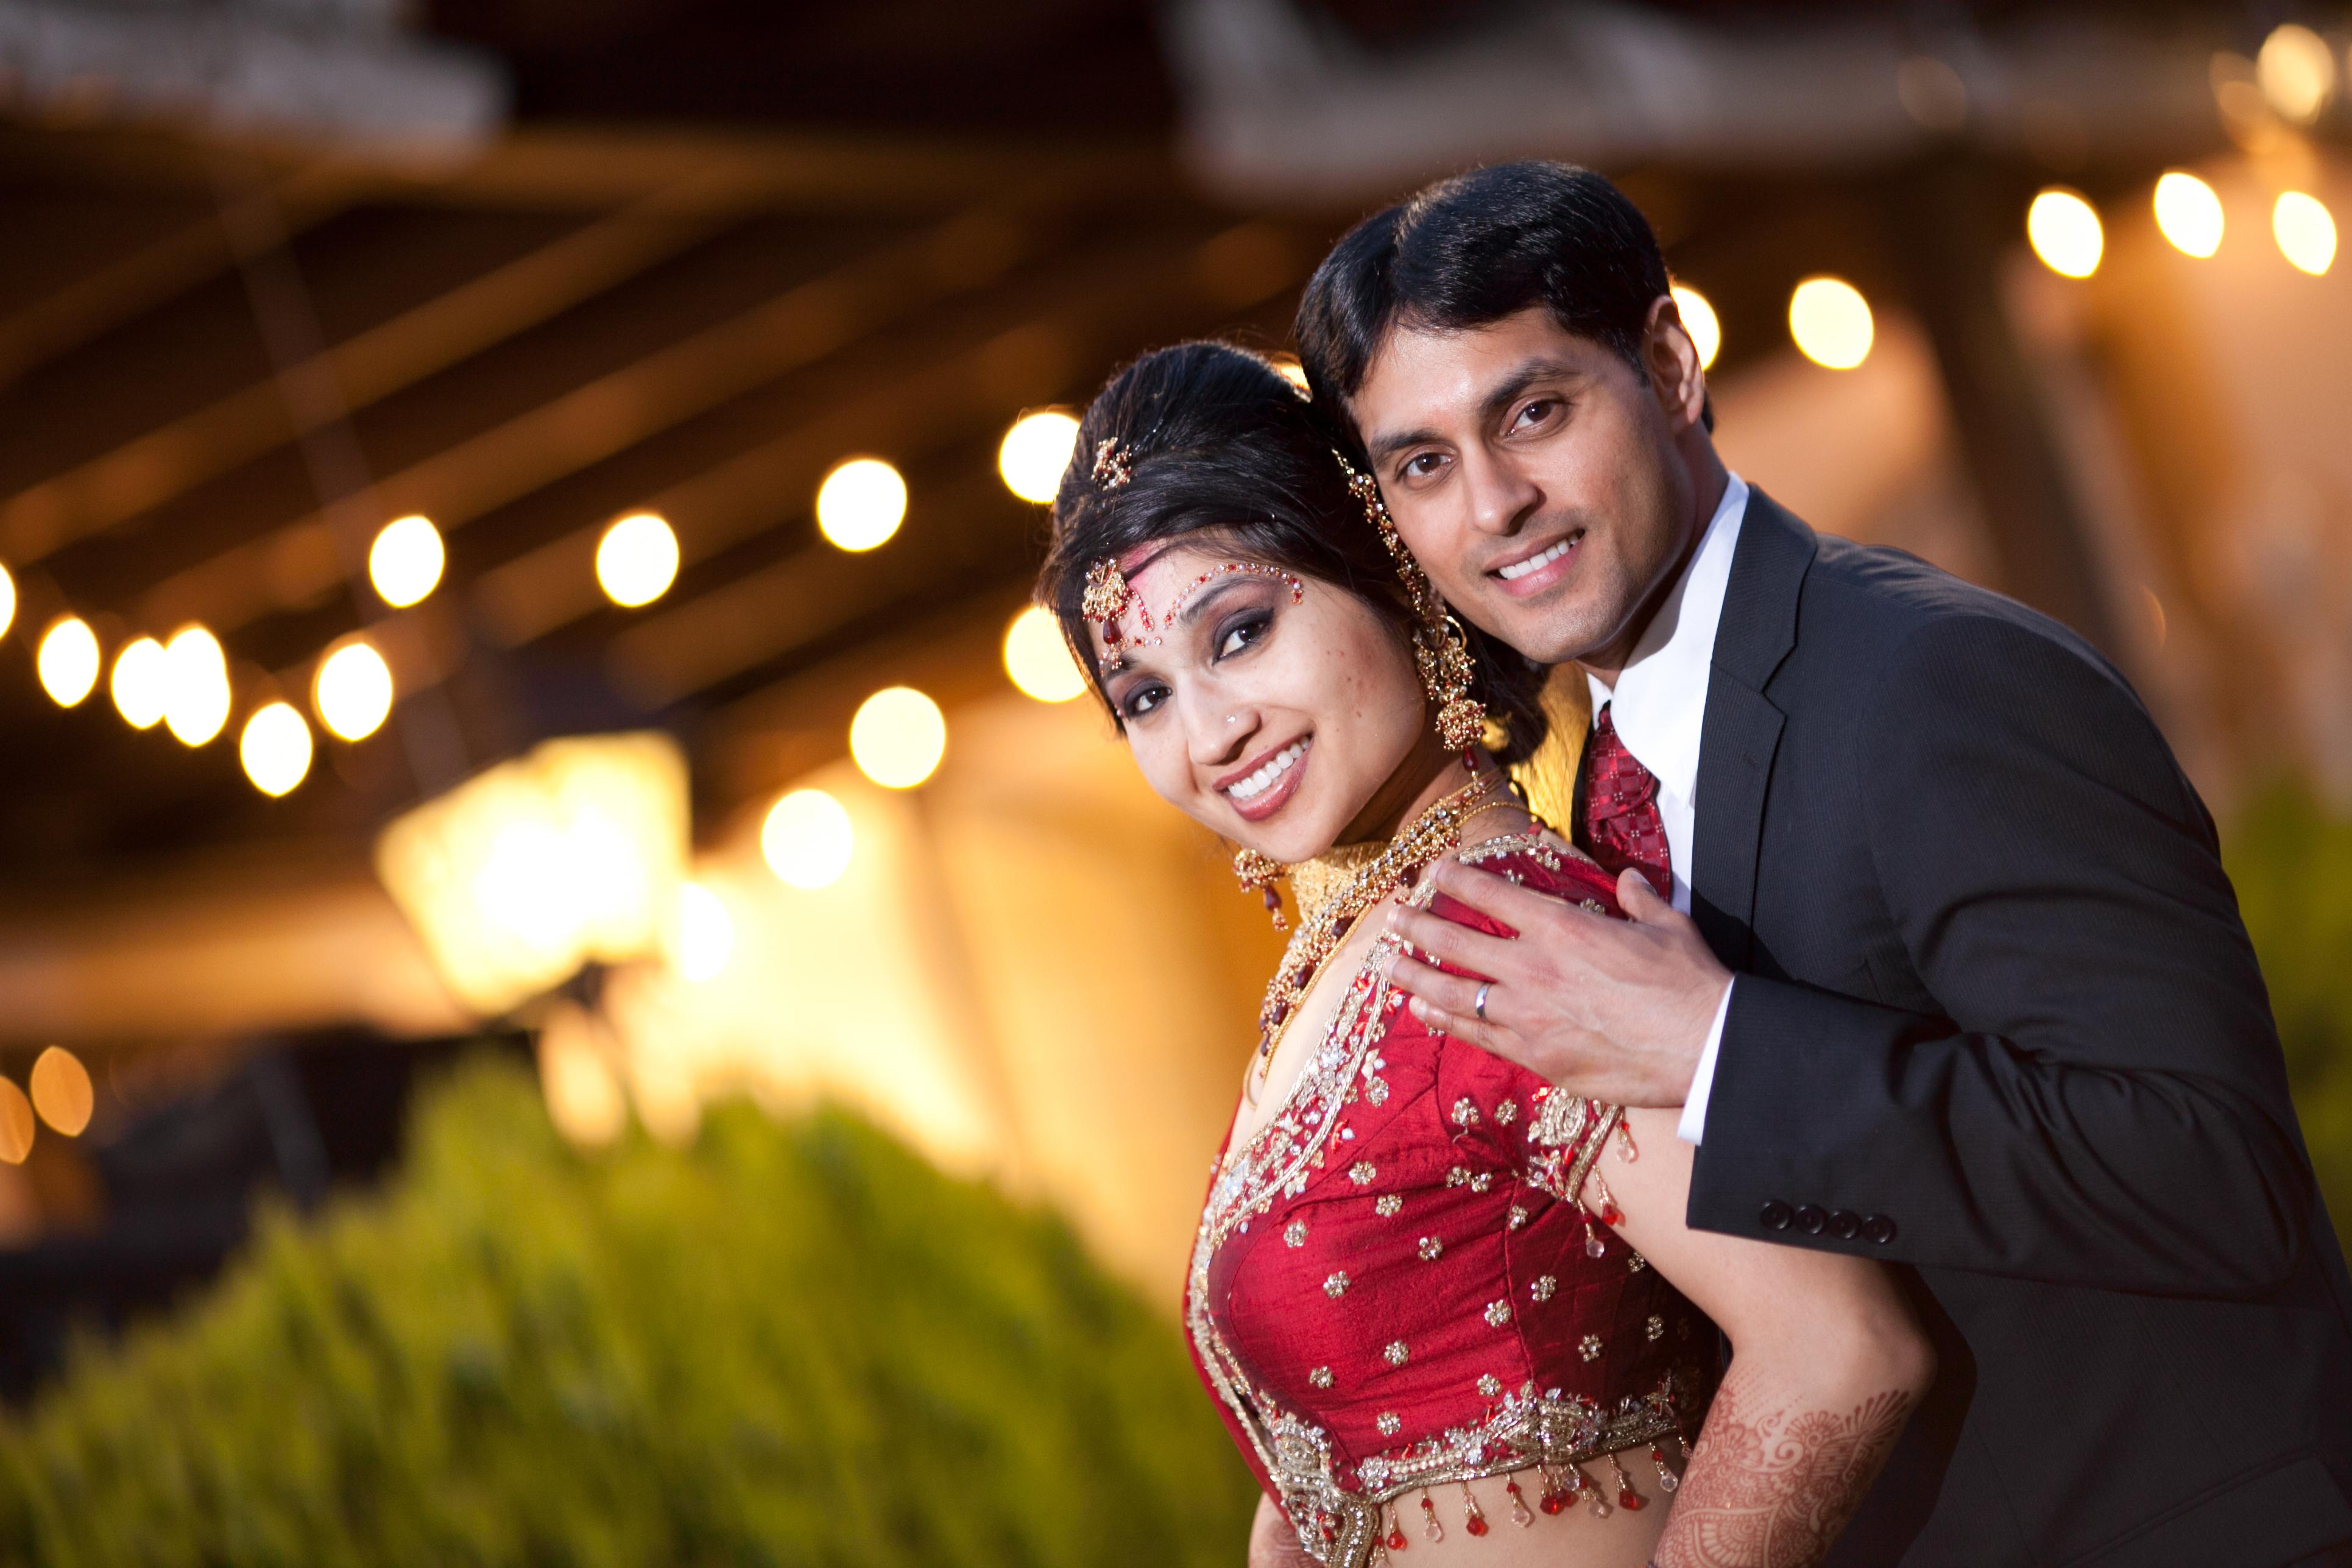 Wedding Day Photography Wedding Couple Photo Style 3861x2574 Wallpaper Teahub Io